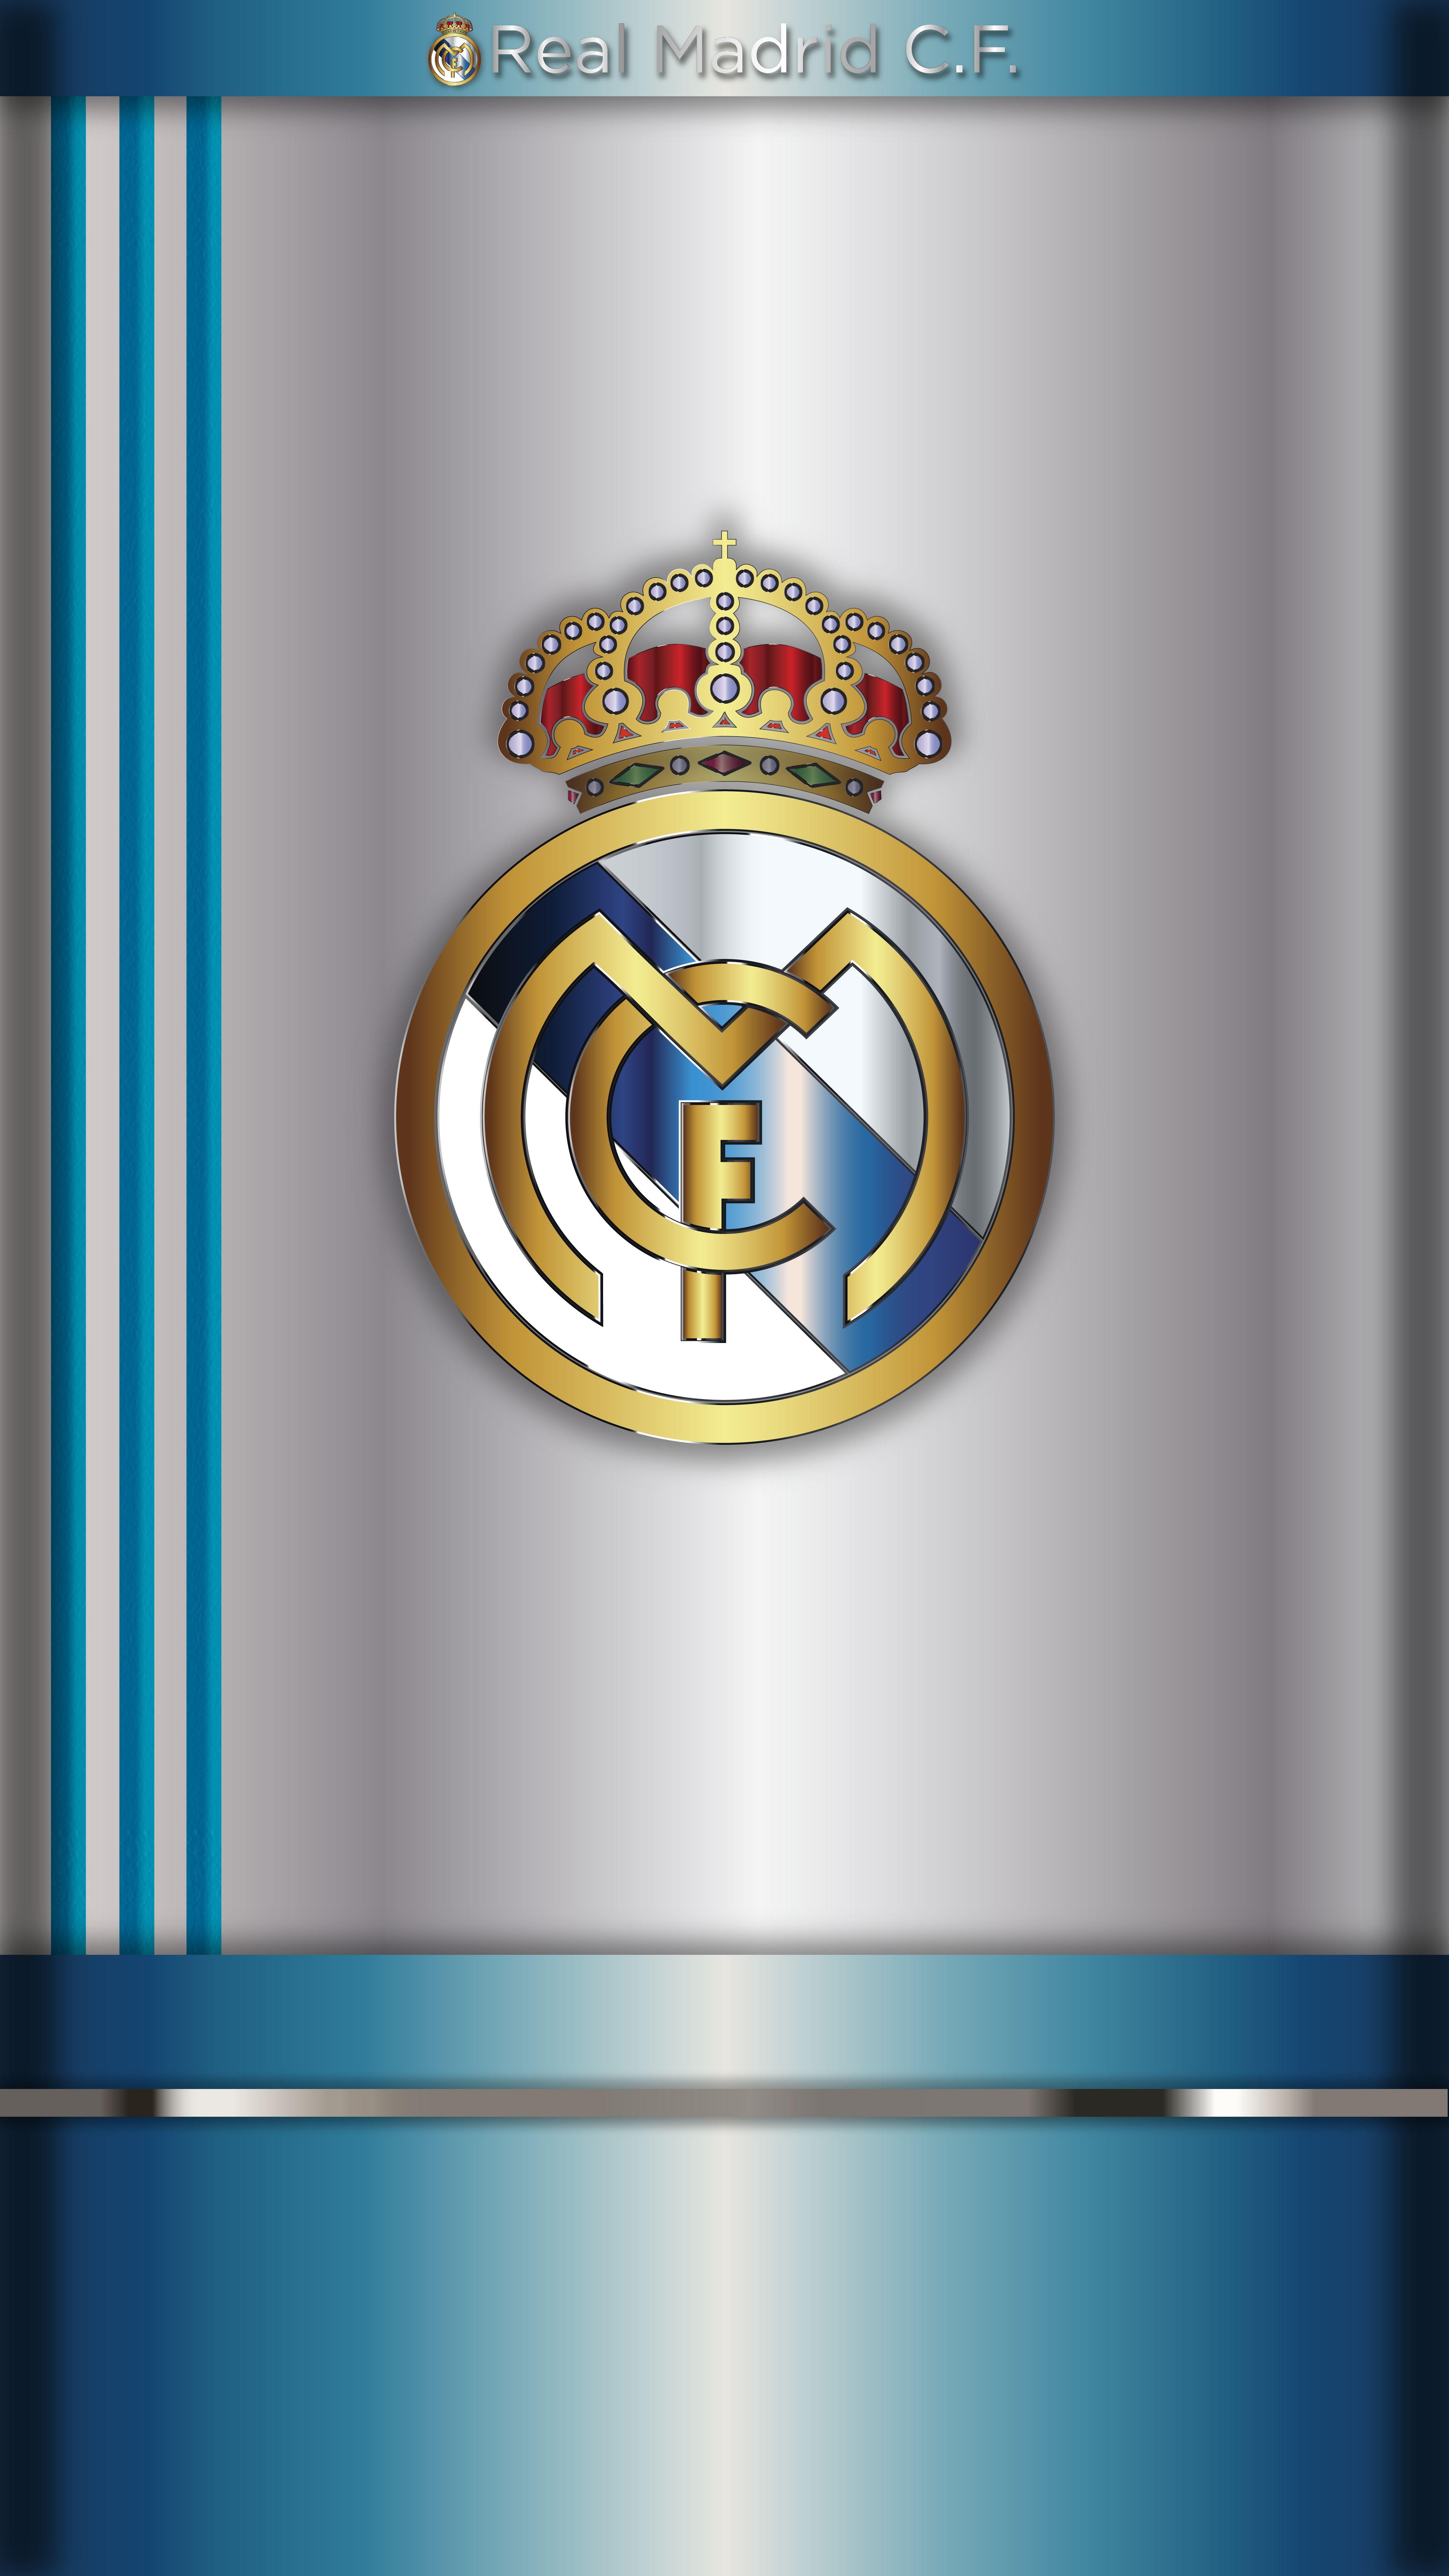 Fondo de pantalla hd real madrid 5 5 pulgadas fondos de for Fondos de pantalla de futbol para celular